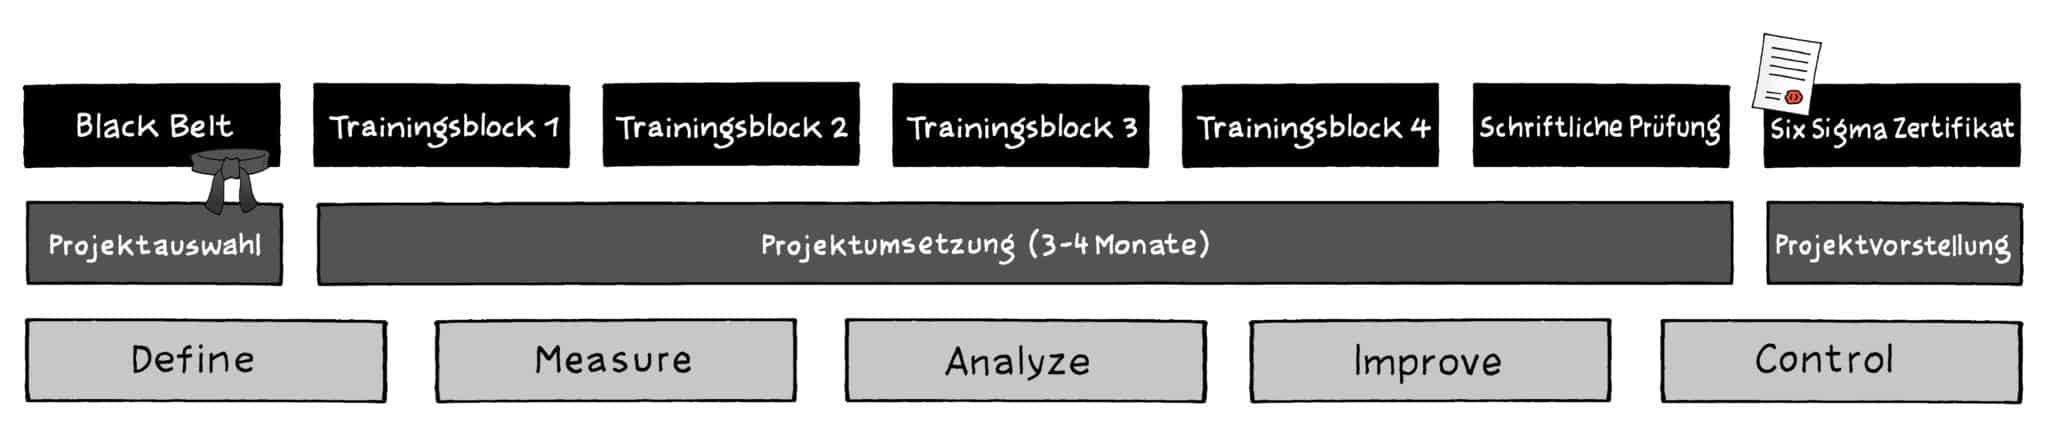 Six Sigma Black Belt Ausbildung   Training   Seminar  (18+2 Tage)